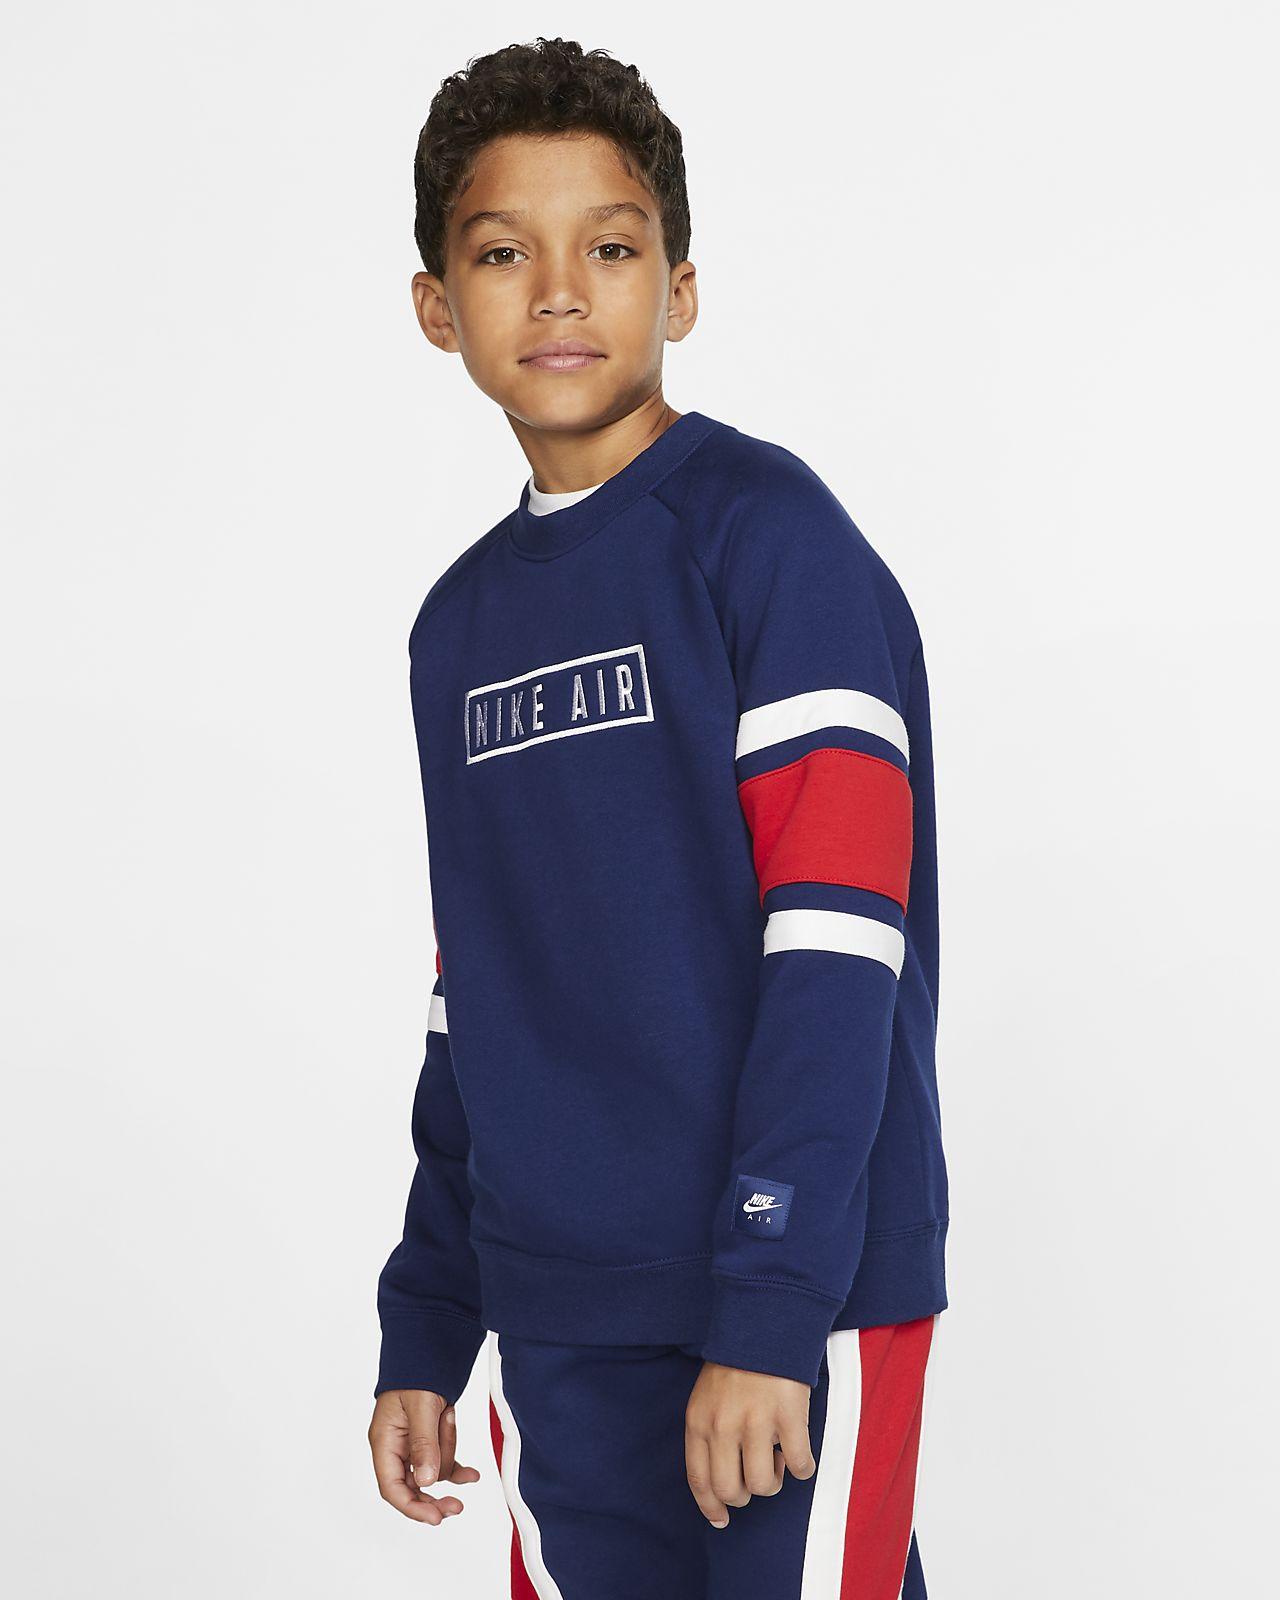 Nike Air Older Kids' Crew